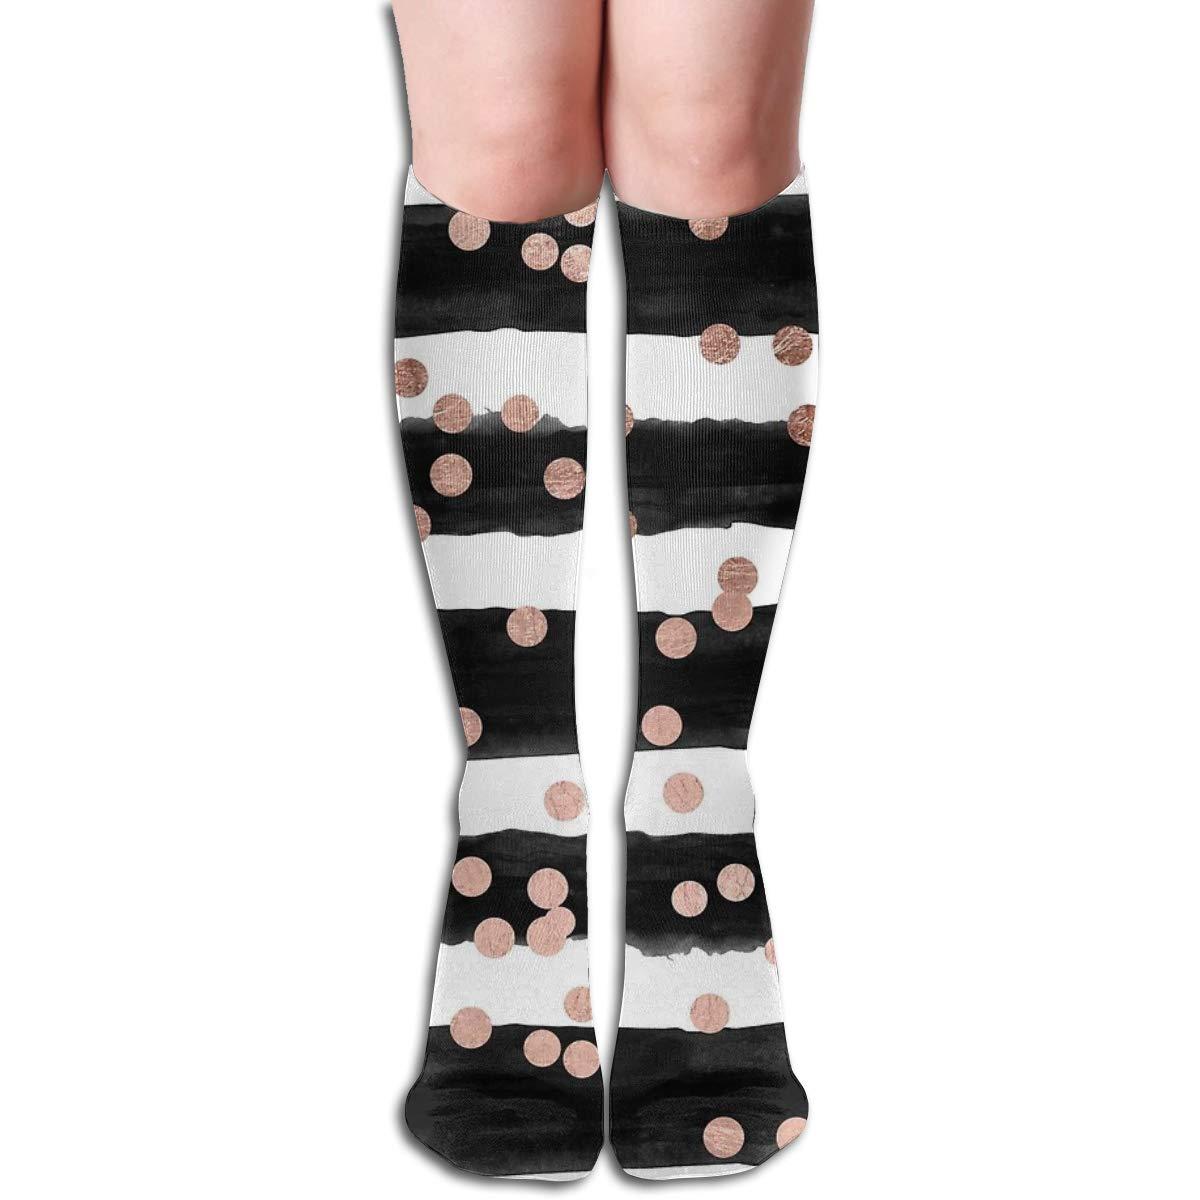 Girly Rose Gold Confetti Black Watercolor StripesFashion Athletic Socks Knee High Socks For Men/&Women All Sport Holiday